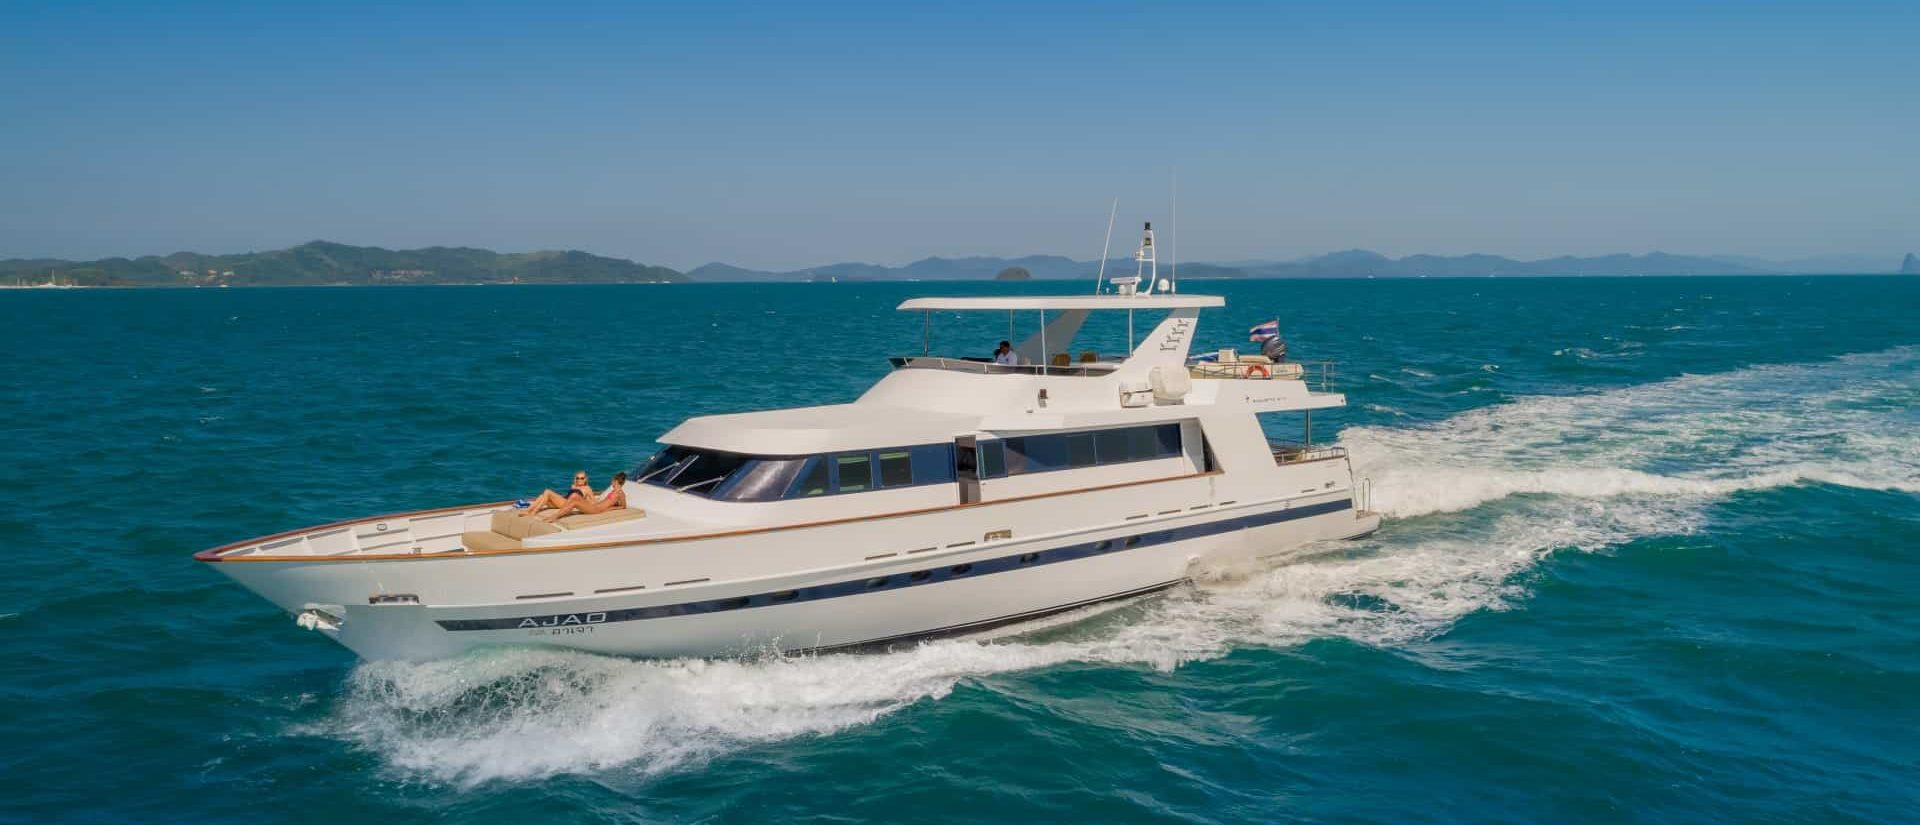 Ajao - Phuket yacht Charter